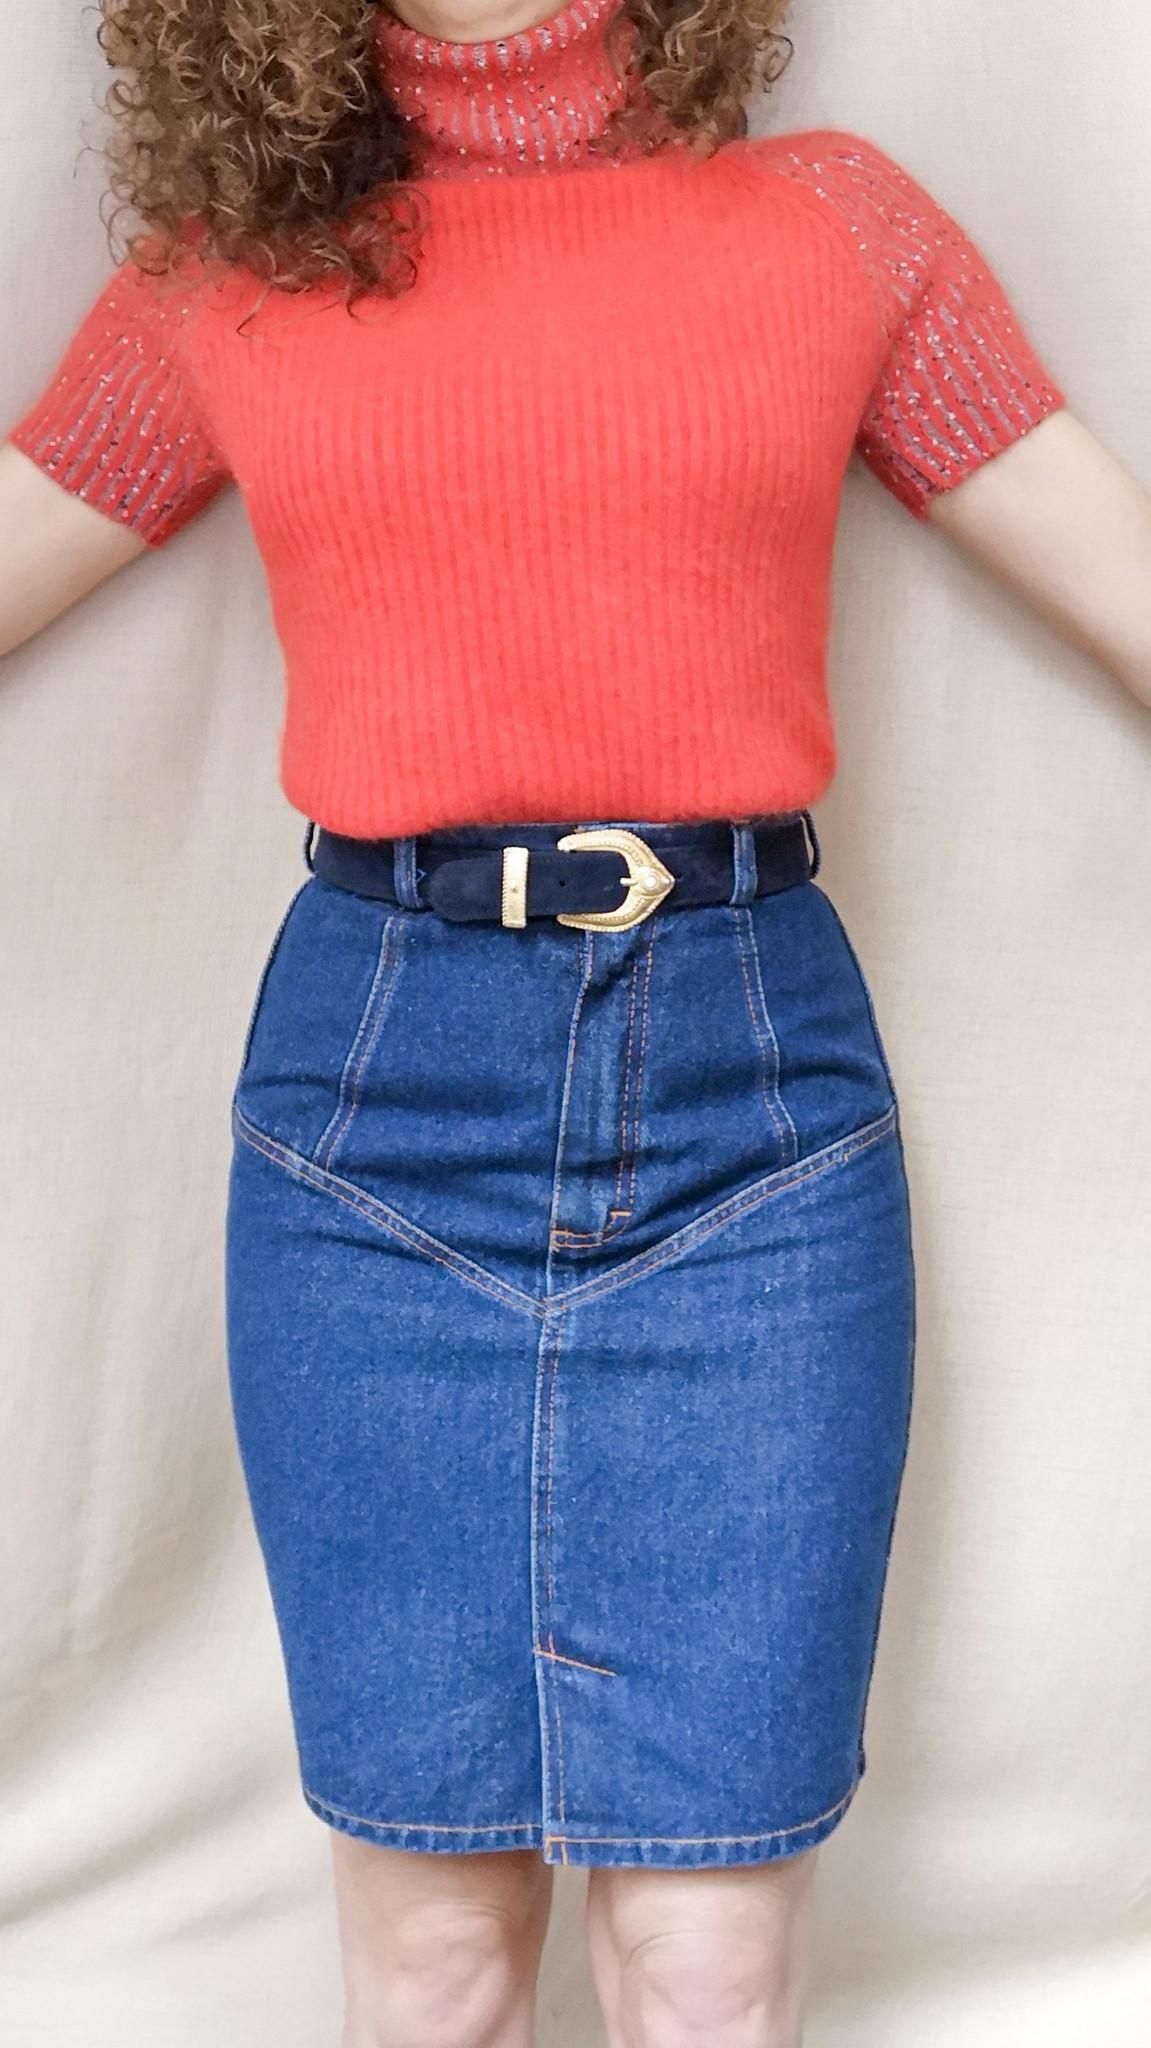 Ołówkowa jeansowa spódnica vintage - PONOŚ SE vintage shop | JestemSlow.pl